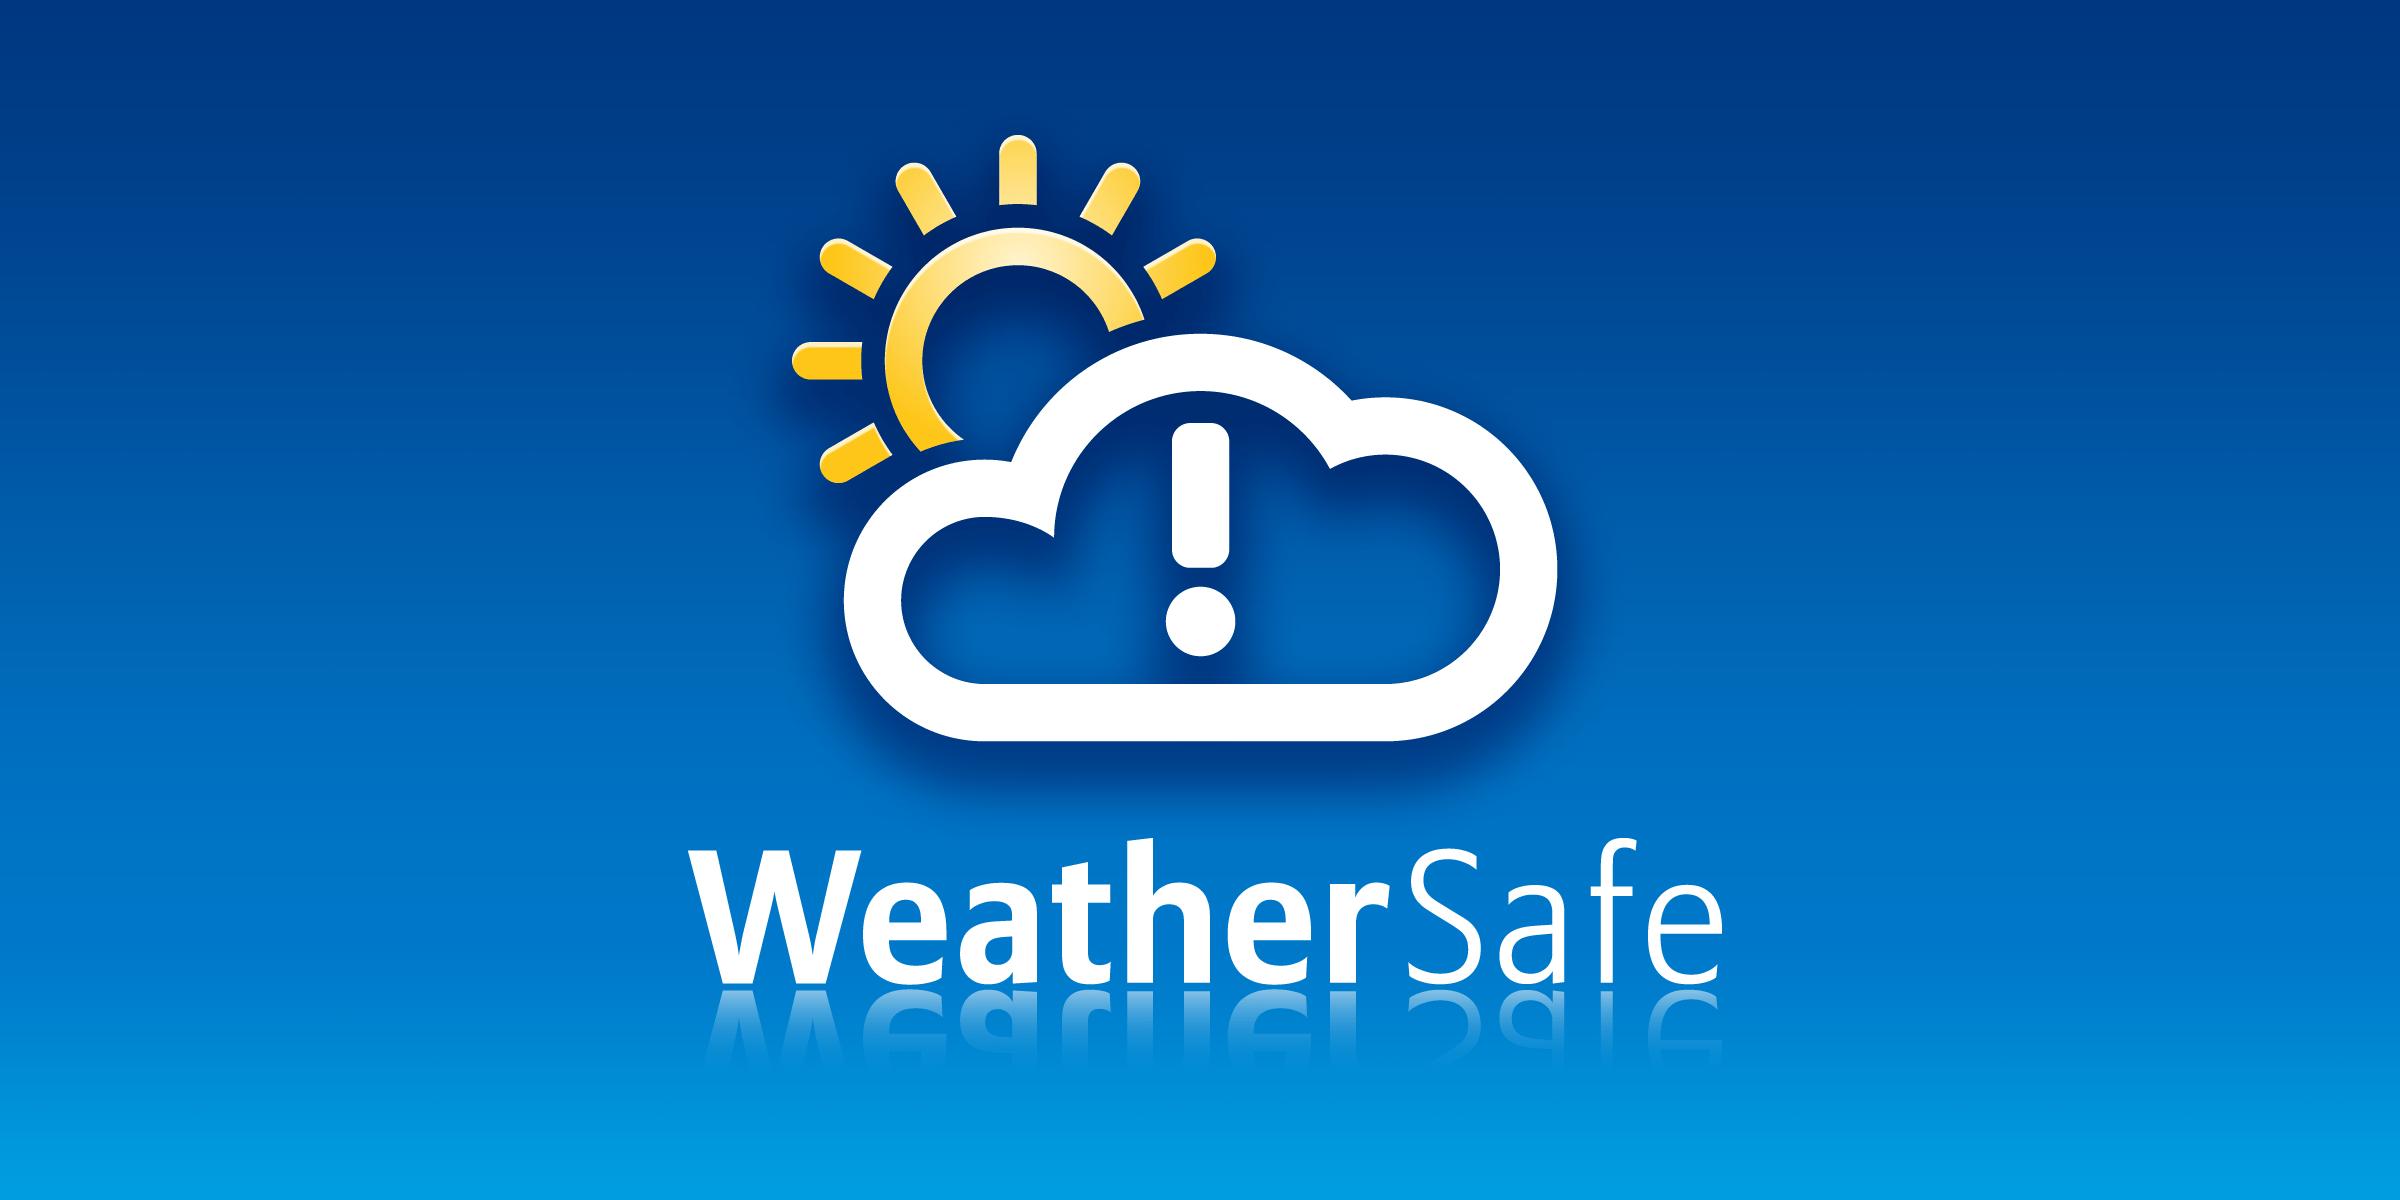 Logo for Allianz WeatherSafe service